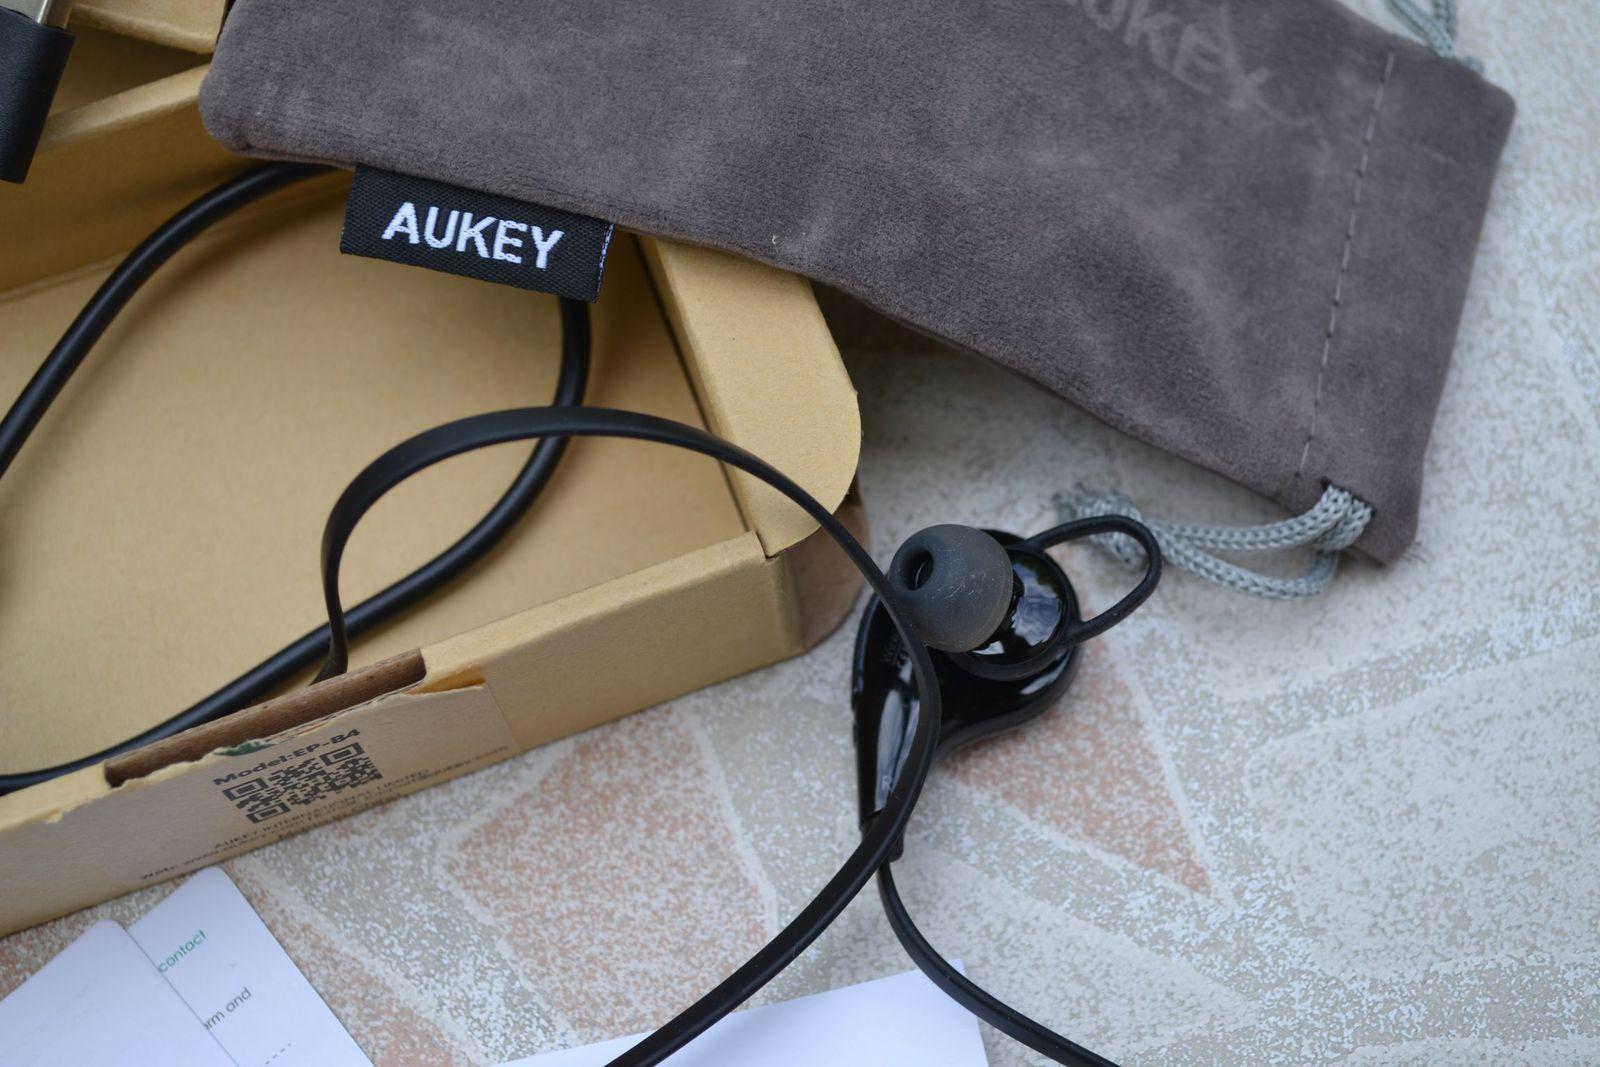 AUKEY EP-B4 distribué par TIANYUE DAZZLING